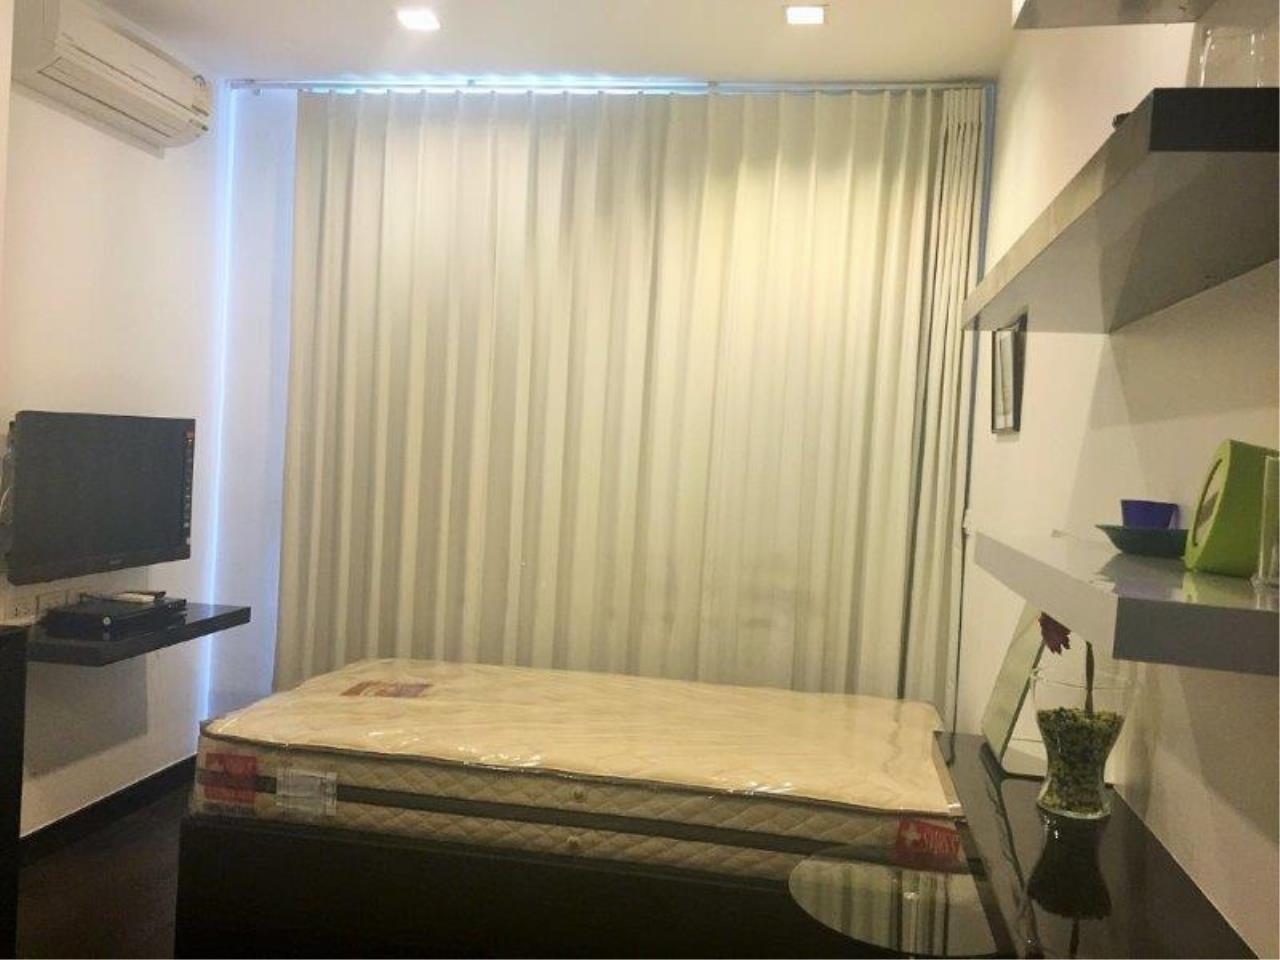 Century21 Skylux Agency's Ideo Q Phayathai / Condo For Sale / 2 Bedroom / 70 SQM / BTS Phaya Thai / Bangkok 8